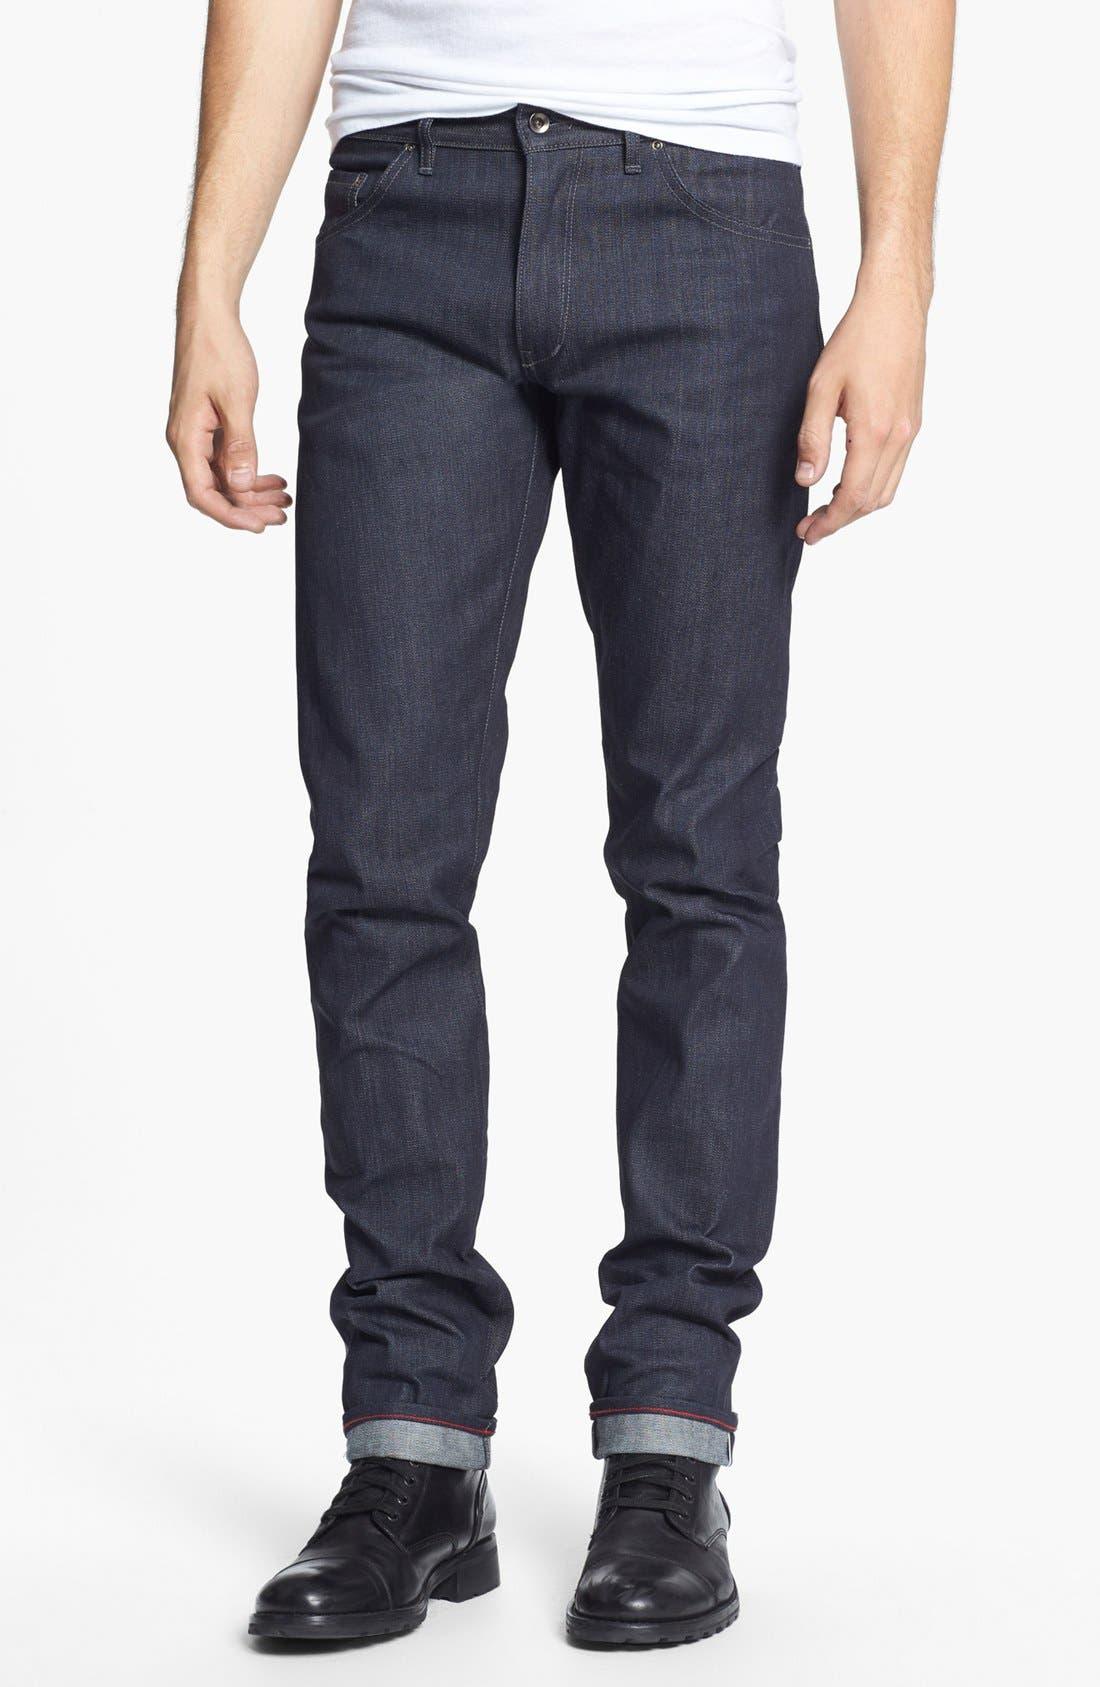 RALEIGH DENIM 'Martin' Skinny Fit Selvedge Jeans, Main, color, 401